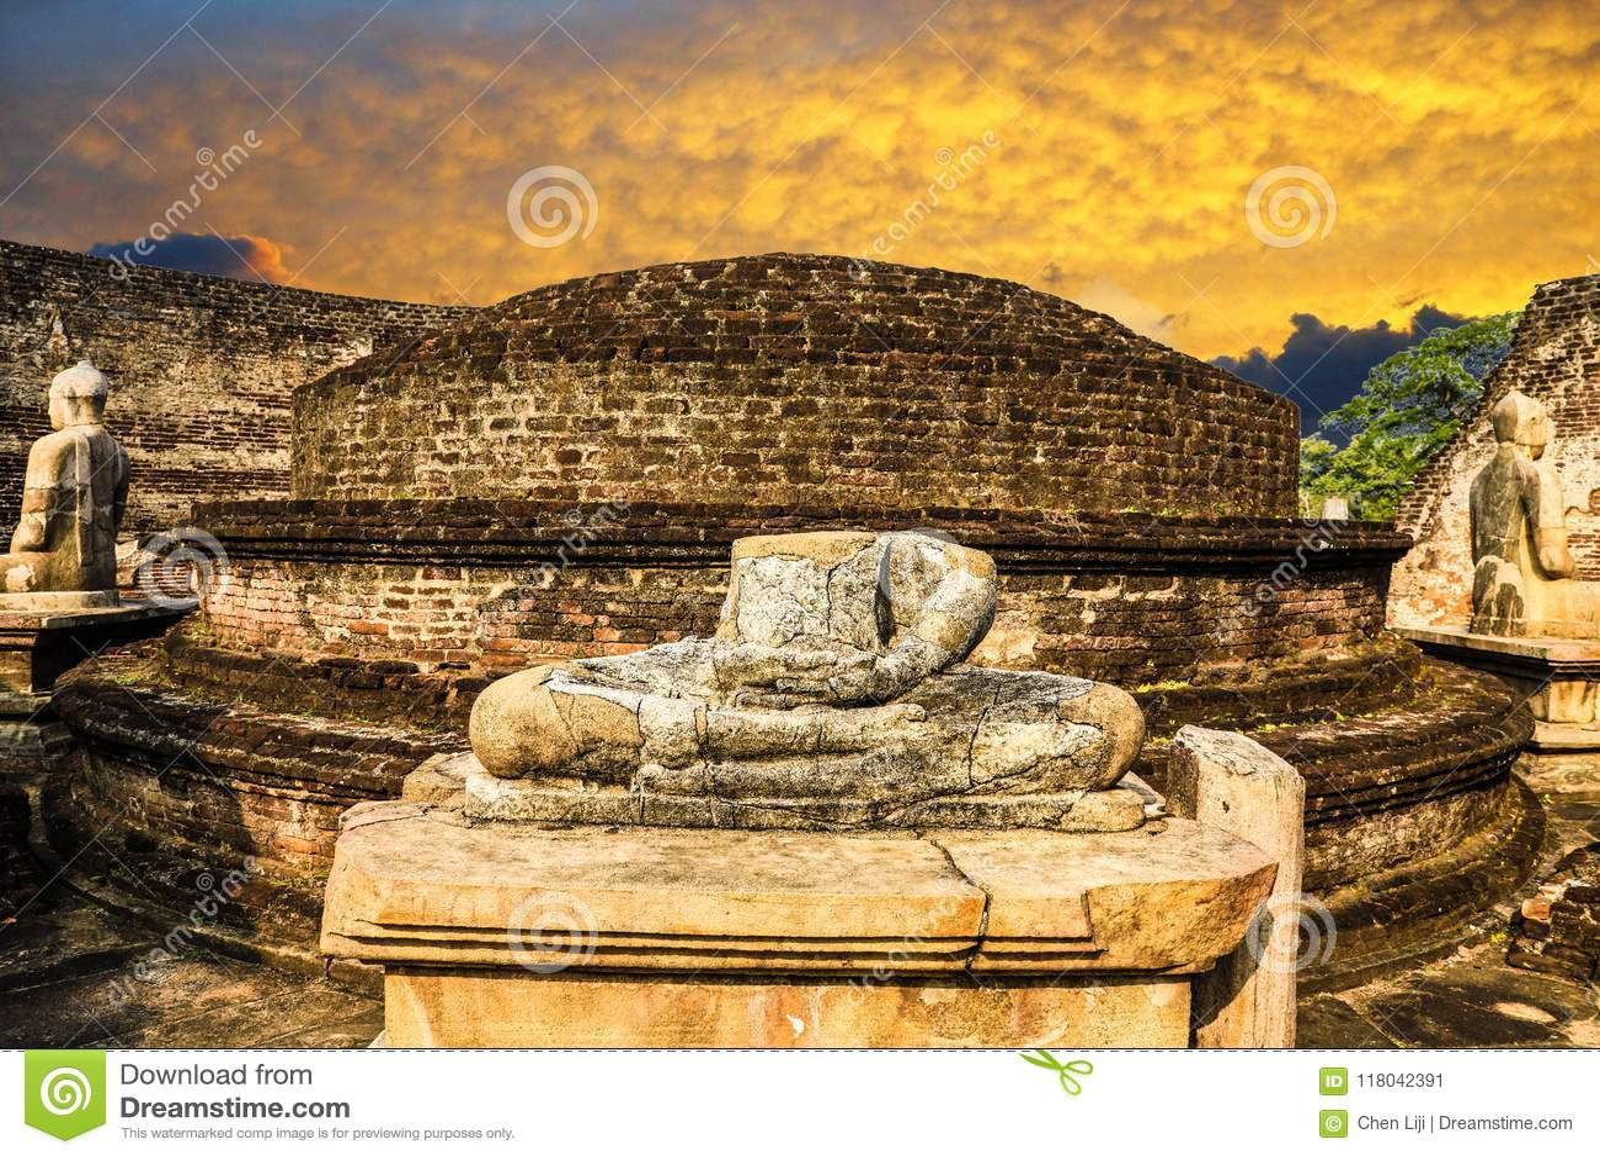 Sri lanka Polonnaruwa Vatadage Sunset